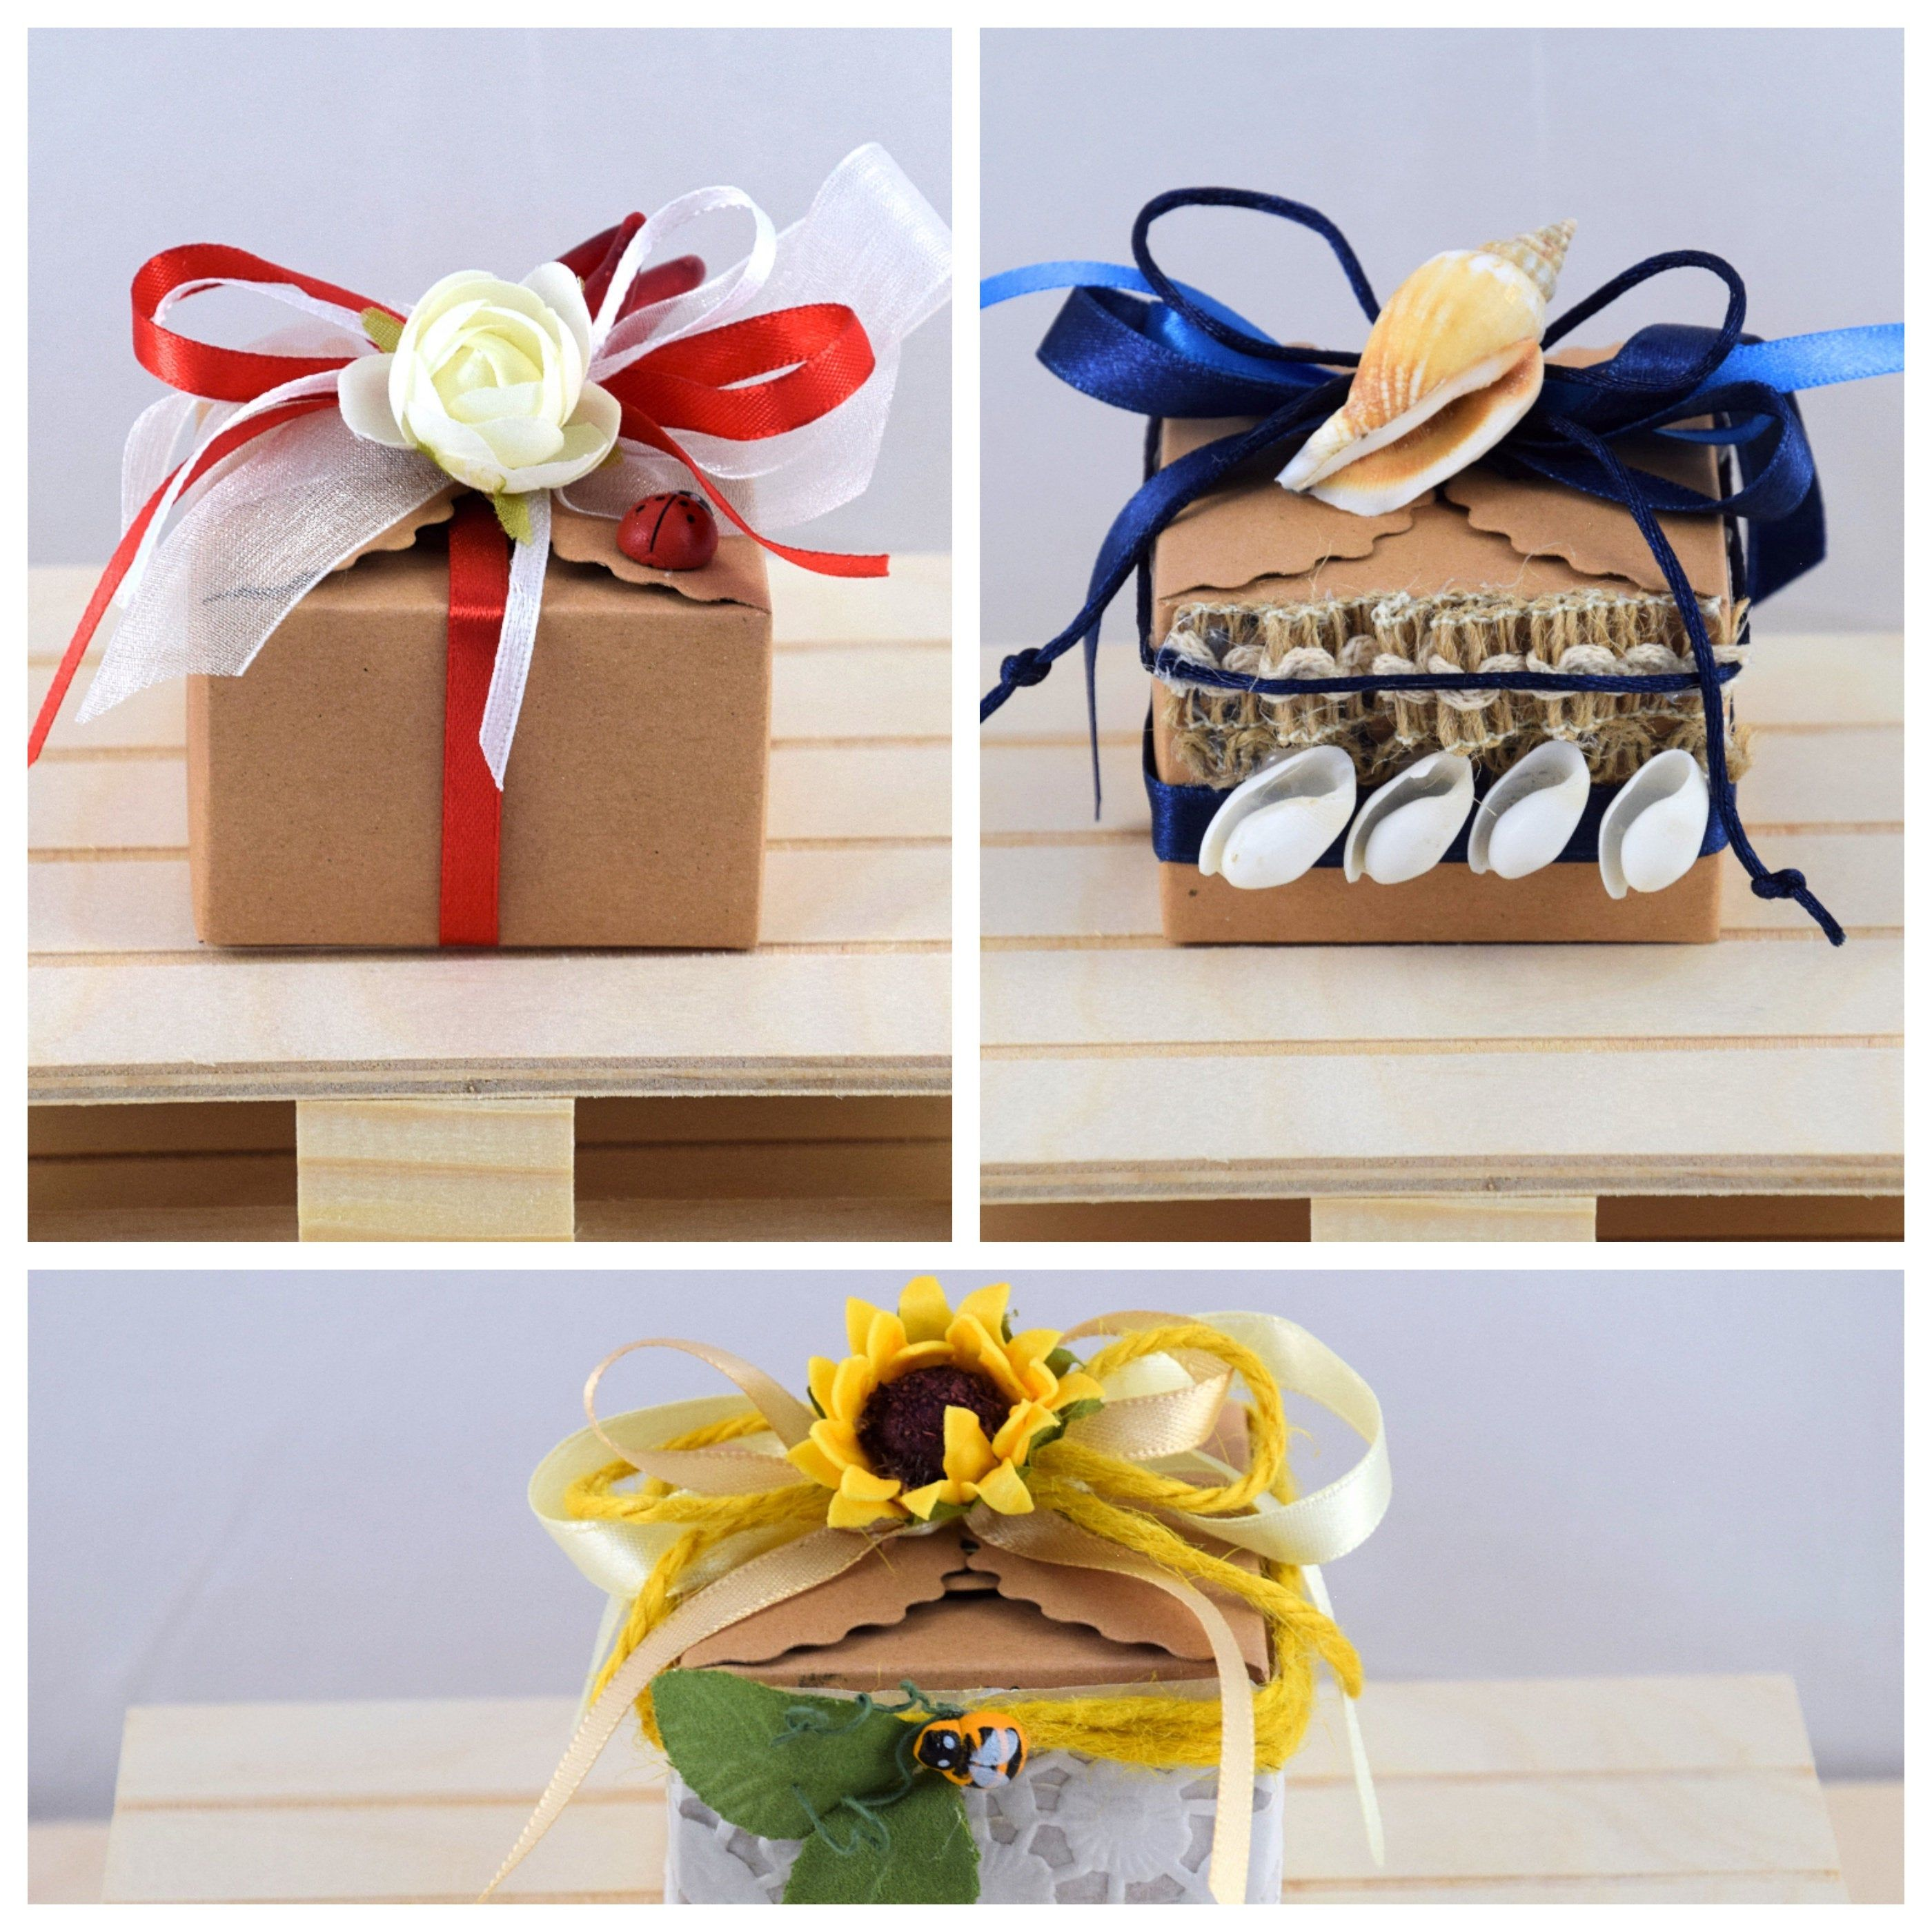 Bomboniere Battesimo Bomboniere Comunione Bomboniere Cresima Bomboniera Laurea Bomboniera Matrimonio Scatola Bomboniera In 2020 Gift Wrapping Gifts Wrap